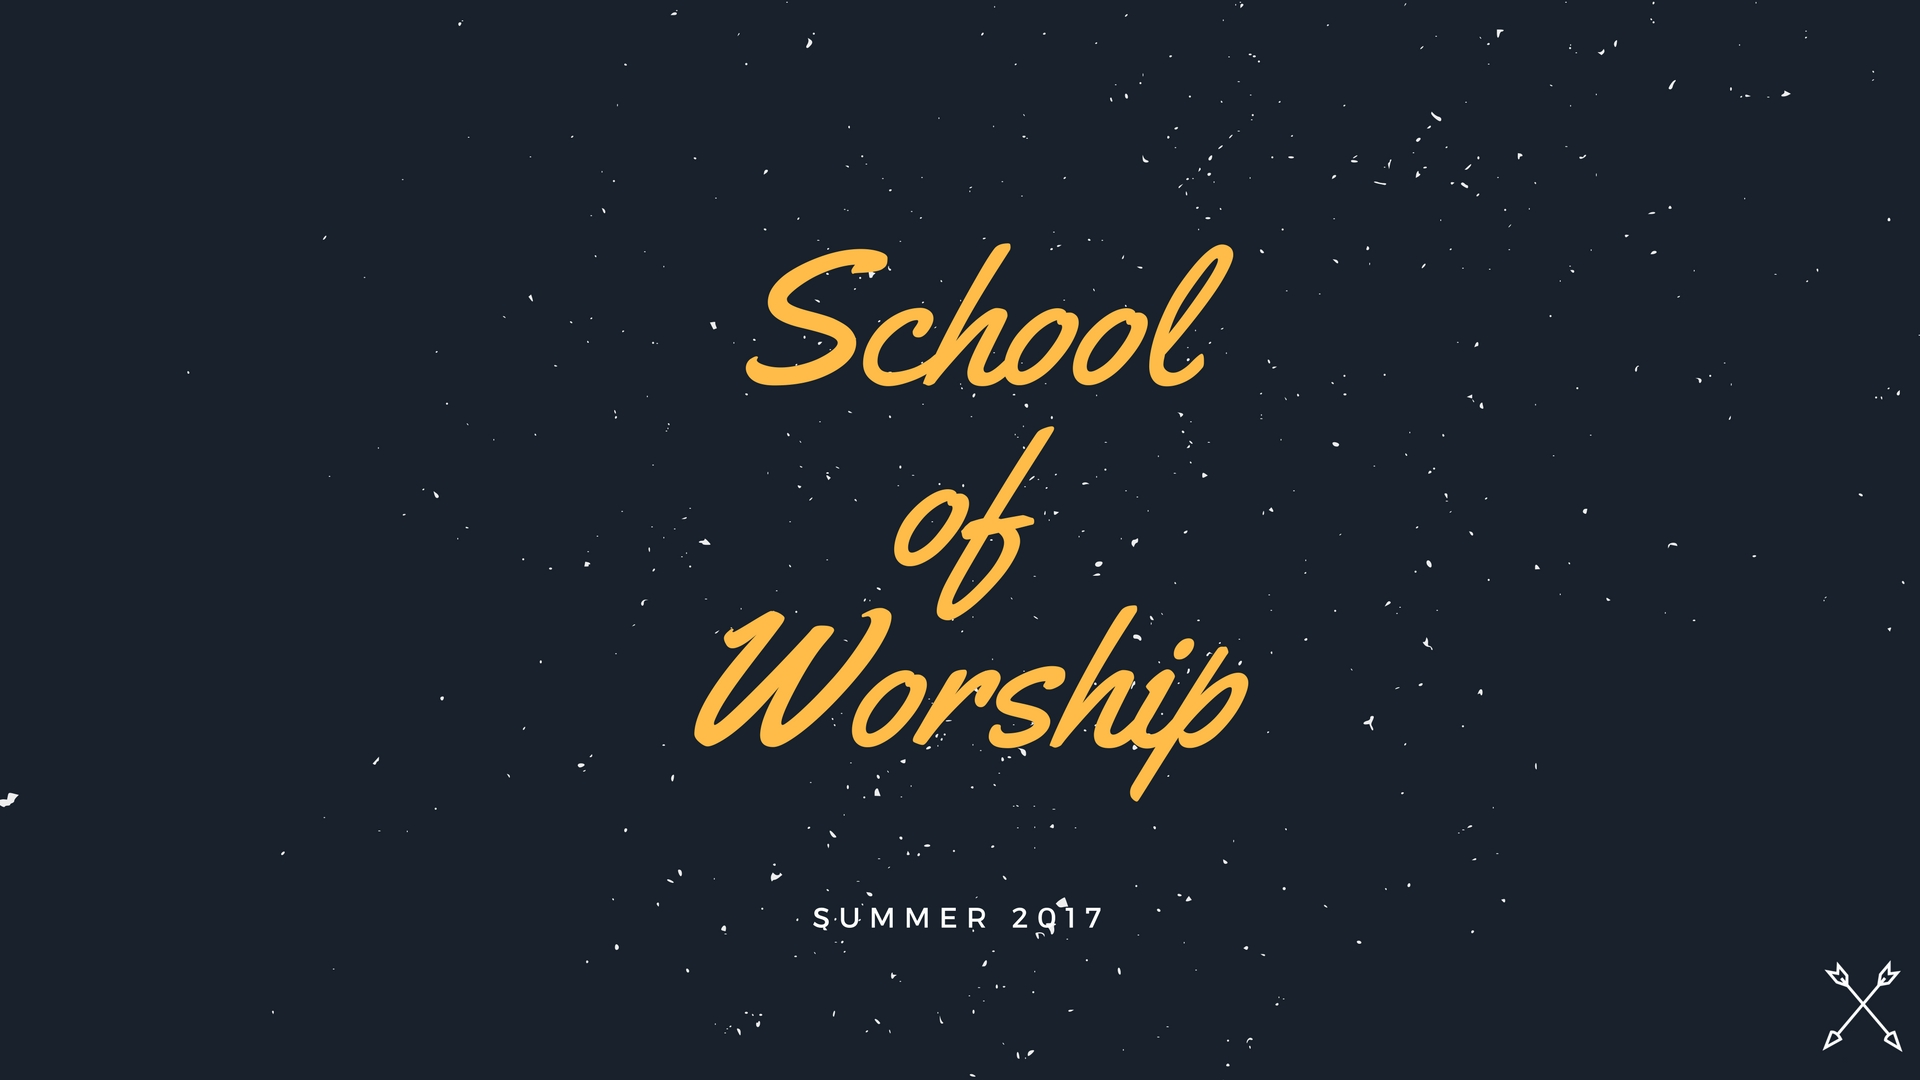 School of worship